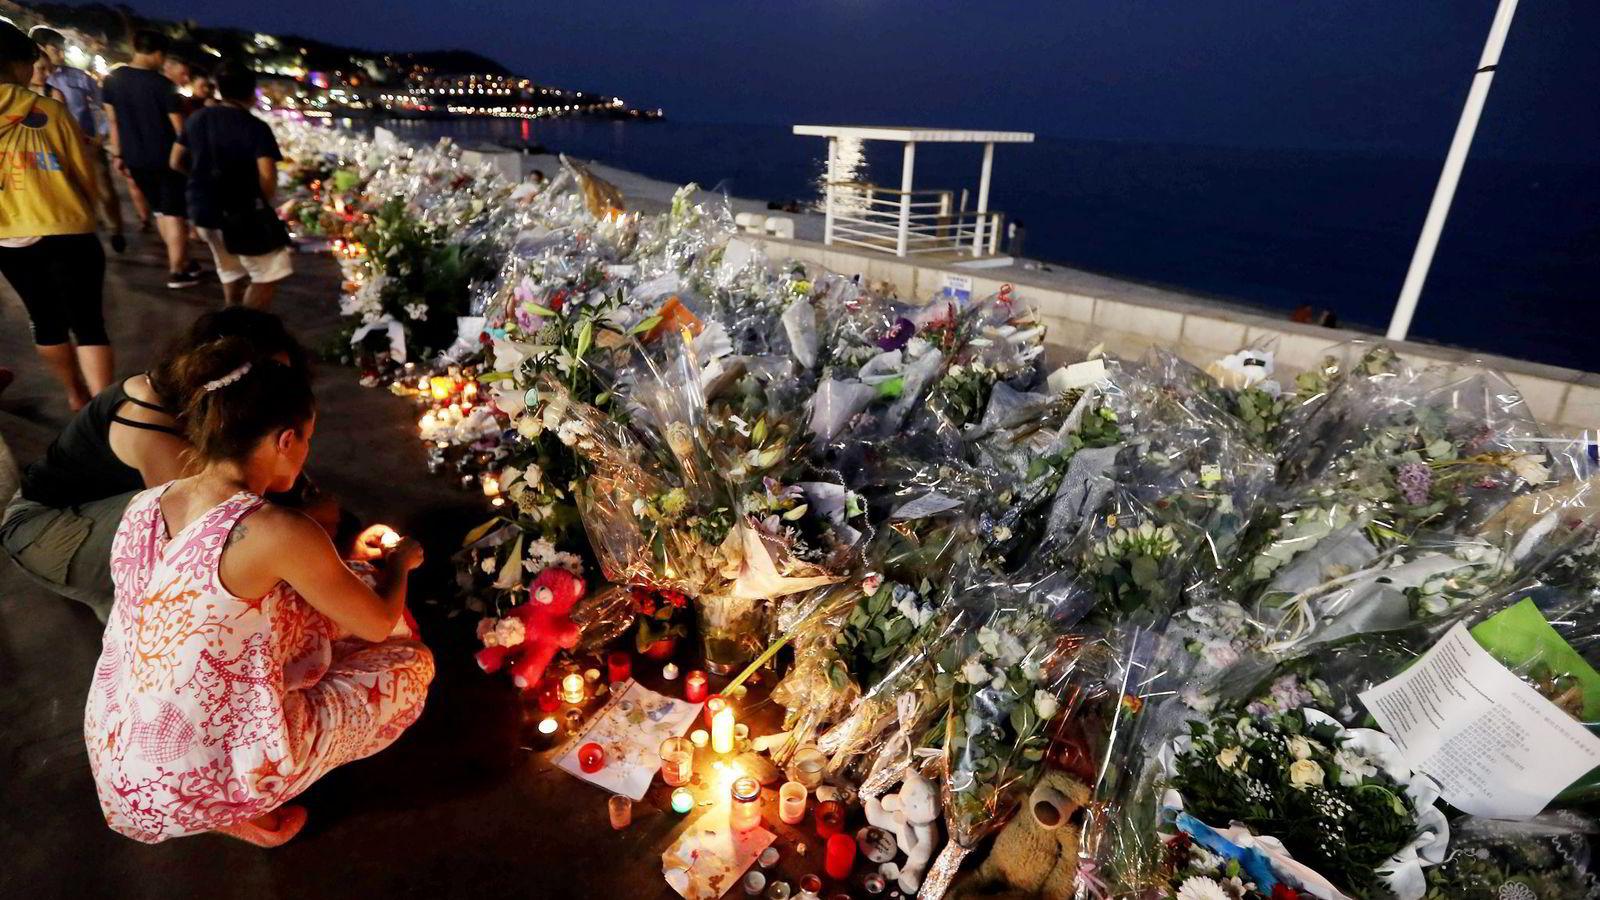 Folk legger ned blomster på Promenade des Anglais i Nice etter terrorangrepet 14. juli 2016. Foto: Valery Hache/Afp/NTB Scanpix.